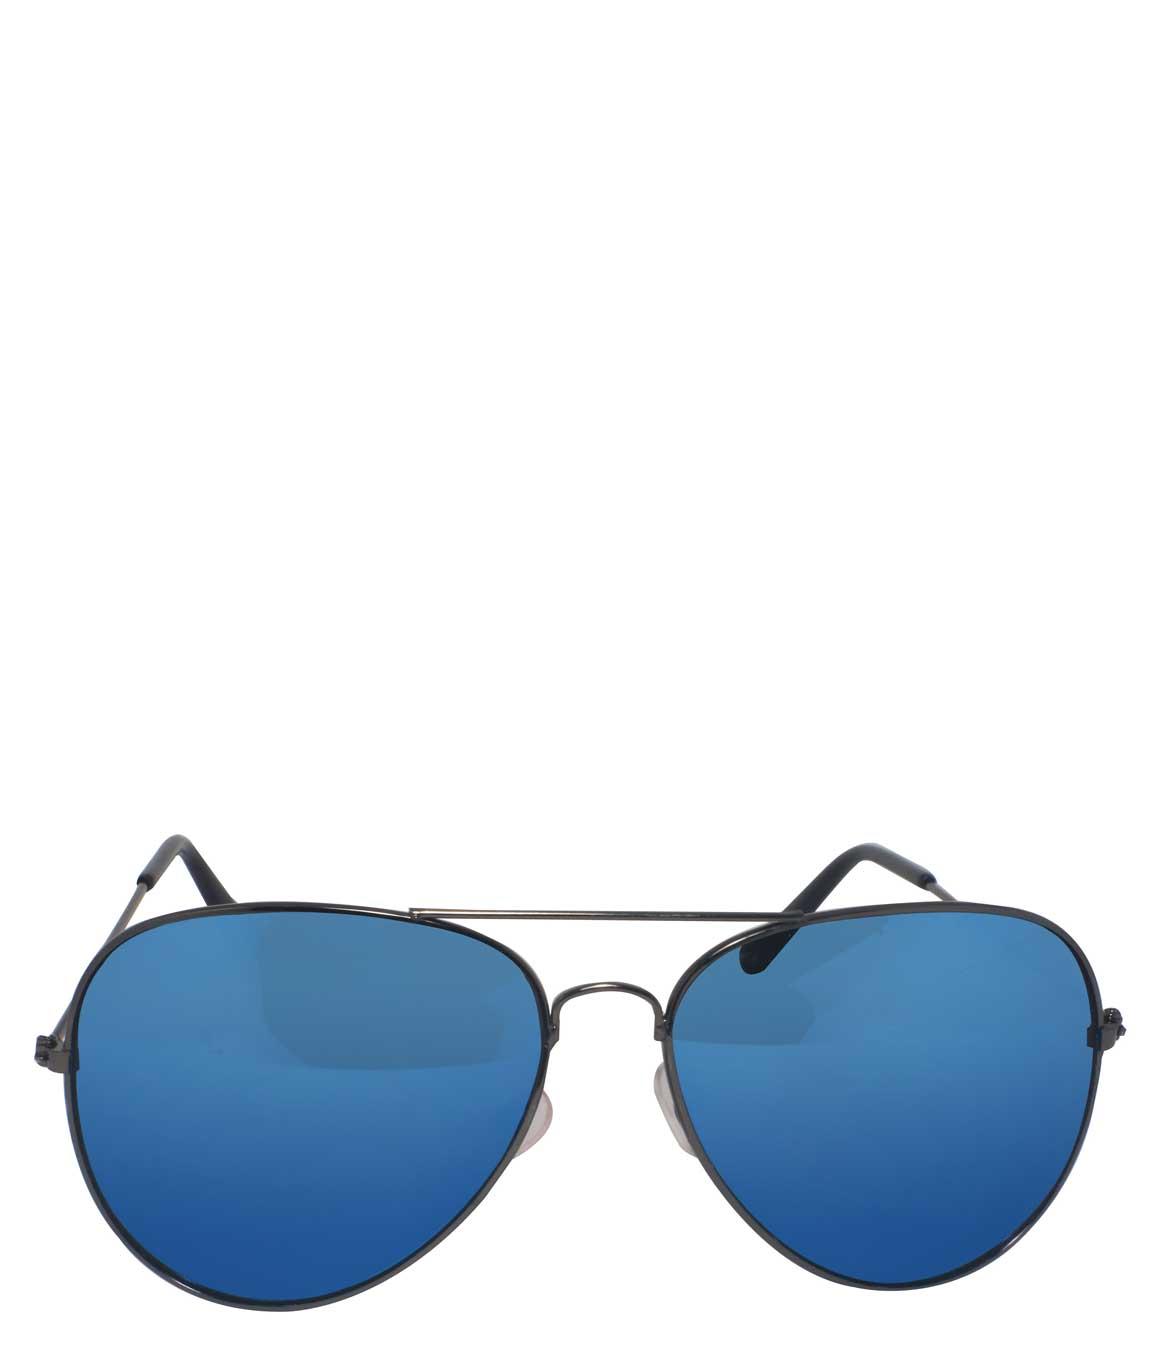 MODERN BLUE AVIATOR